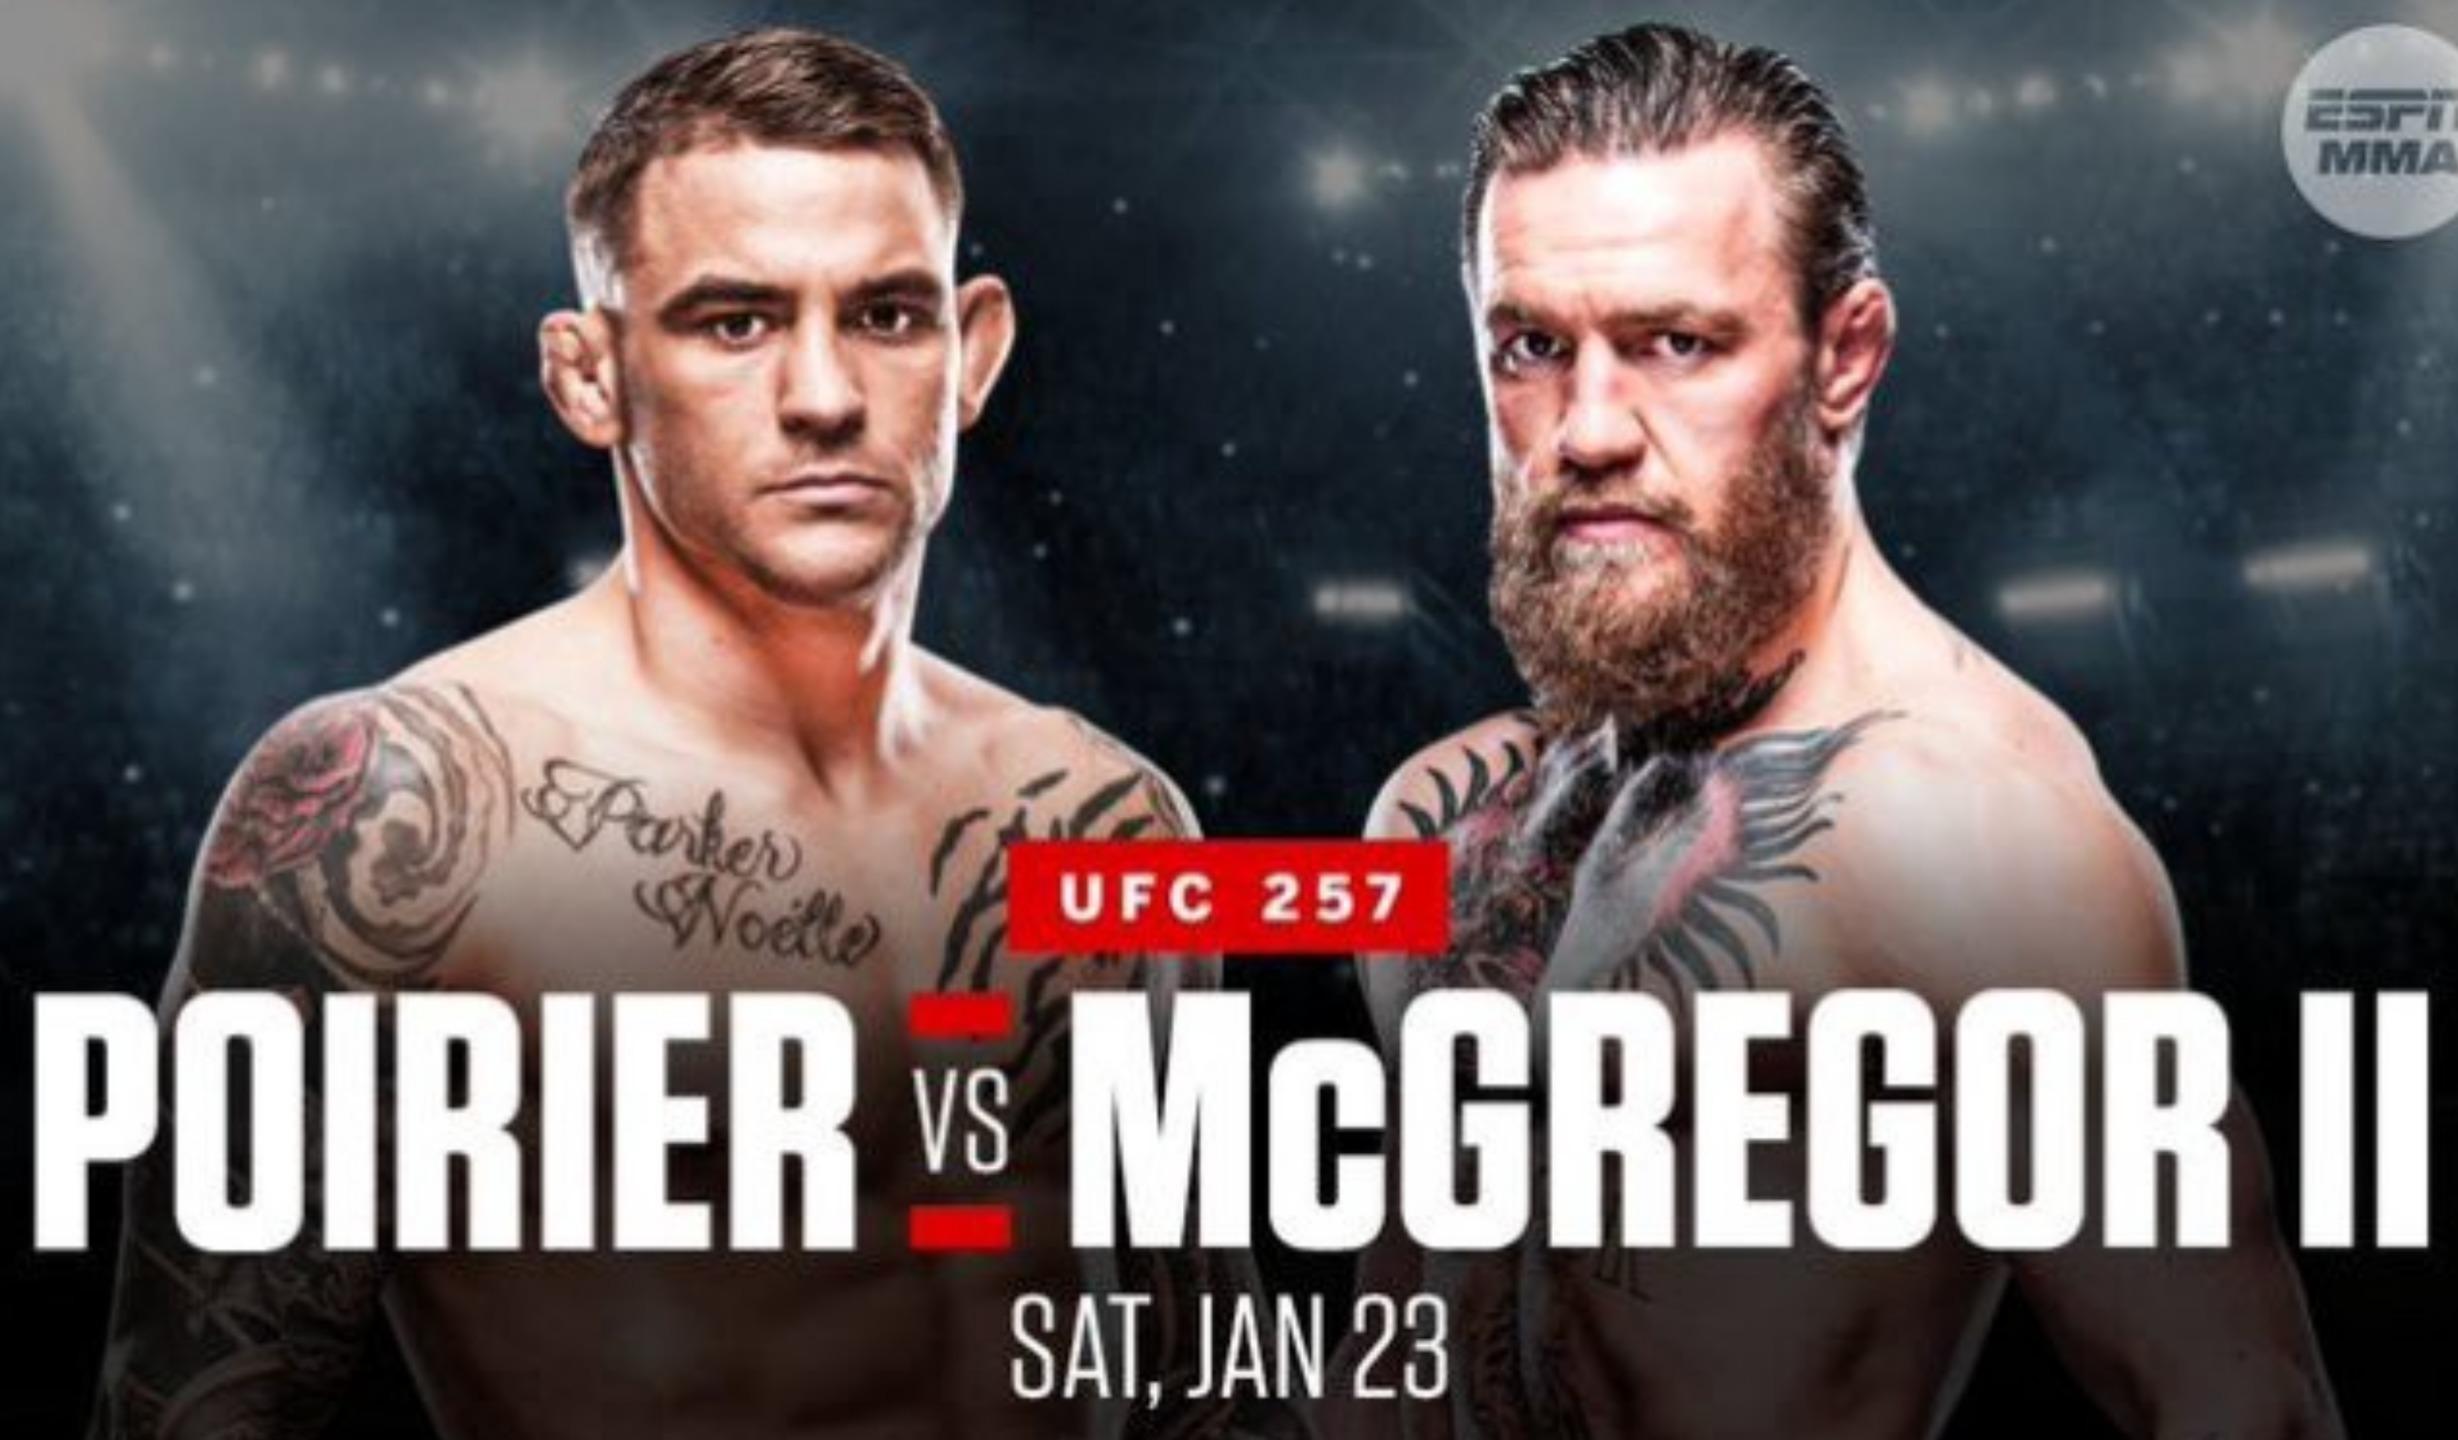 McGregor vs Poirier 2 Live Stream Free Fight On Re (@mcgregorvspoirier2livestreamfree) Cover Image